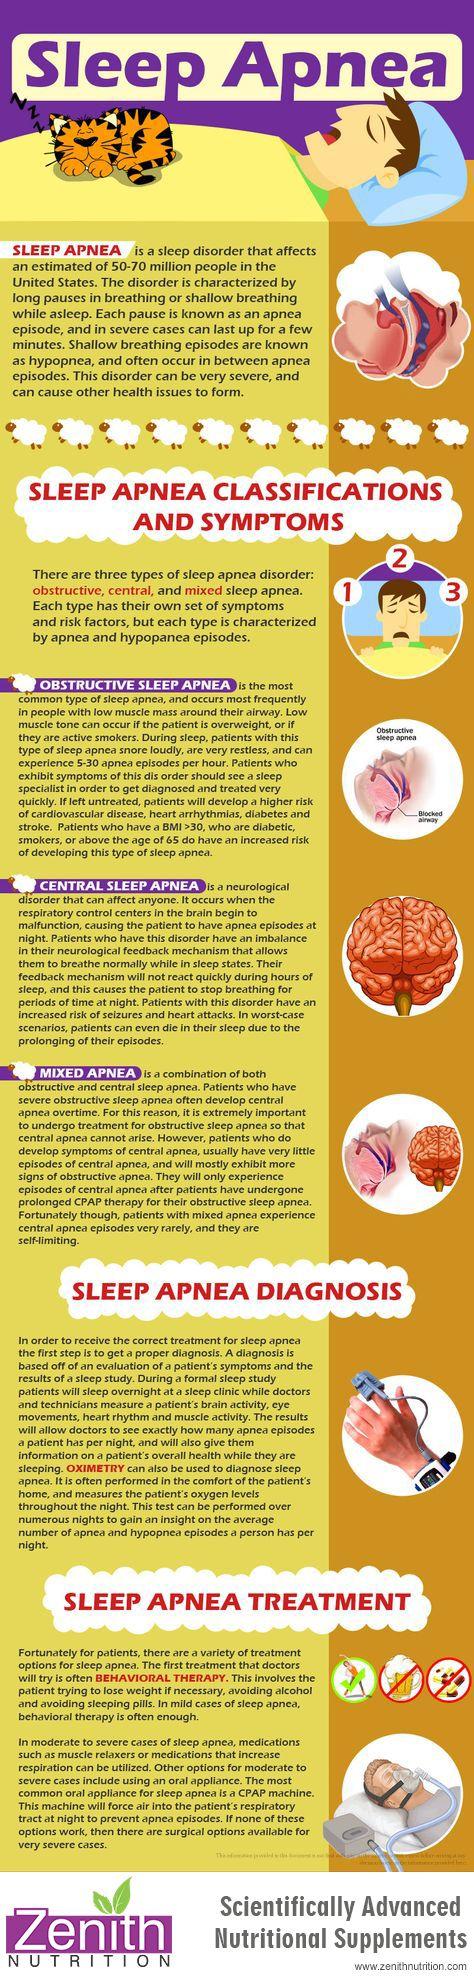 Sleep Apnea. Sleep Apnea classifications & symptoms - Obstructive sleep apnea, Central sleep apnea, Mixed apnea. Sleep apnea diagnosis. Sleep apnea treatment. Best supplements from Zenith Nutrition. Health Supplements. Nutritional Supplements. Health Infographics